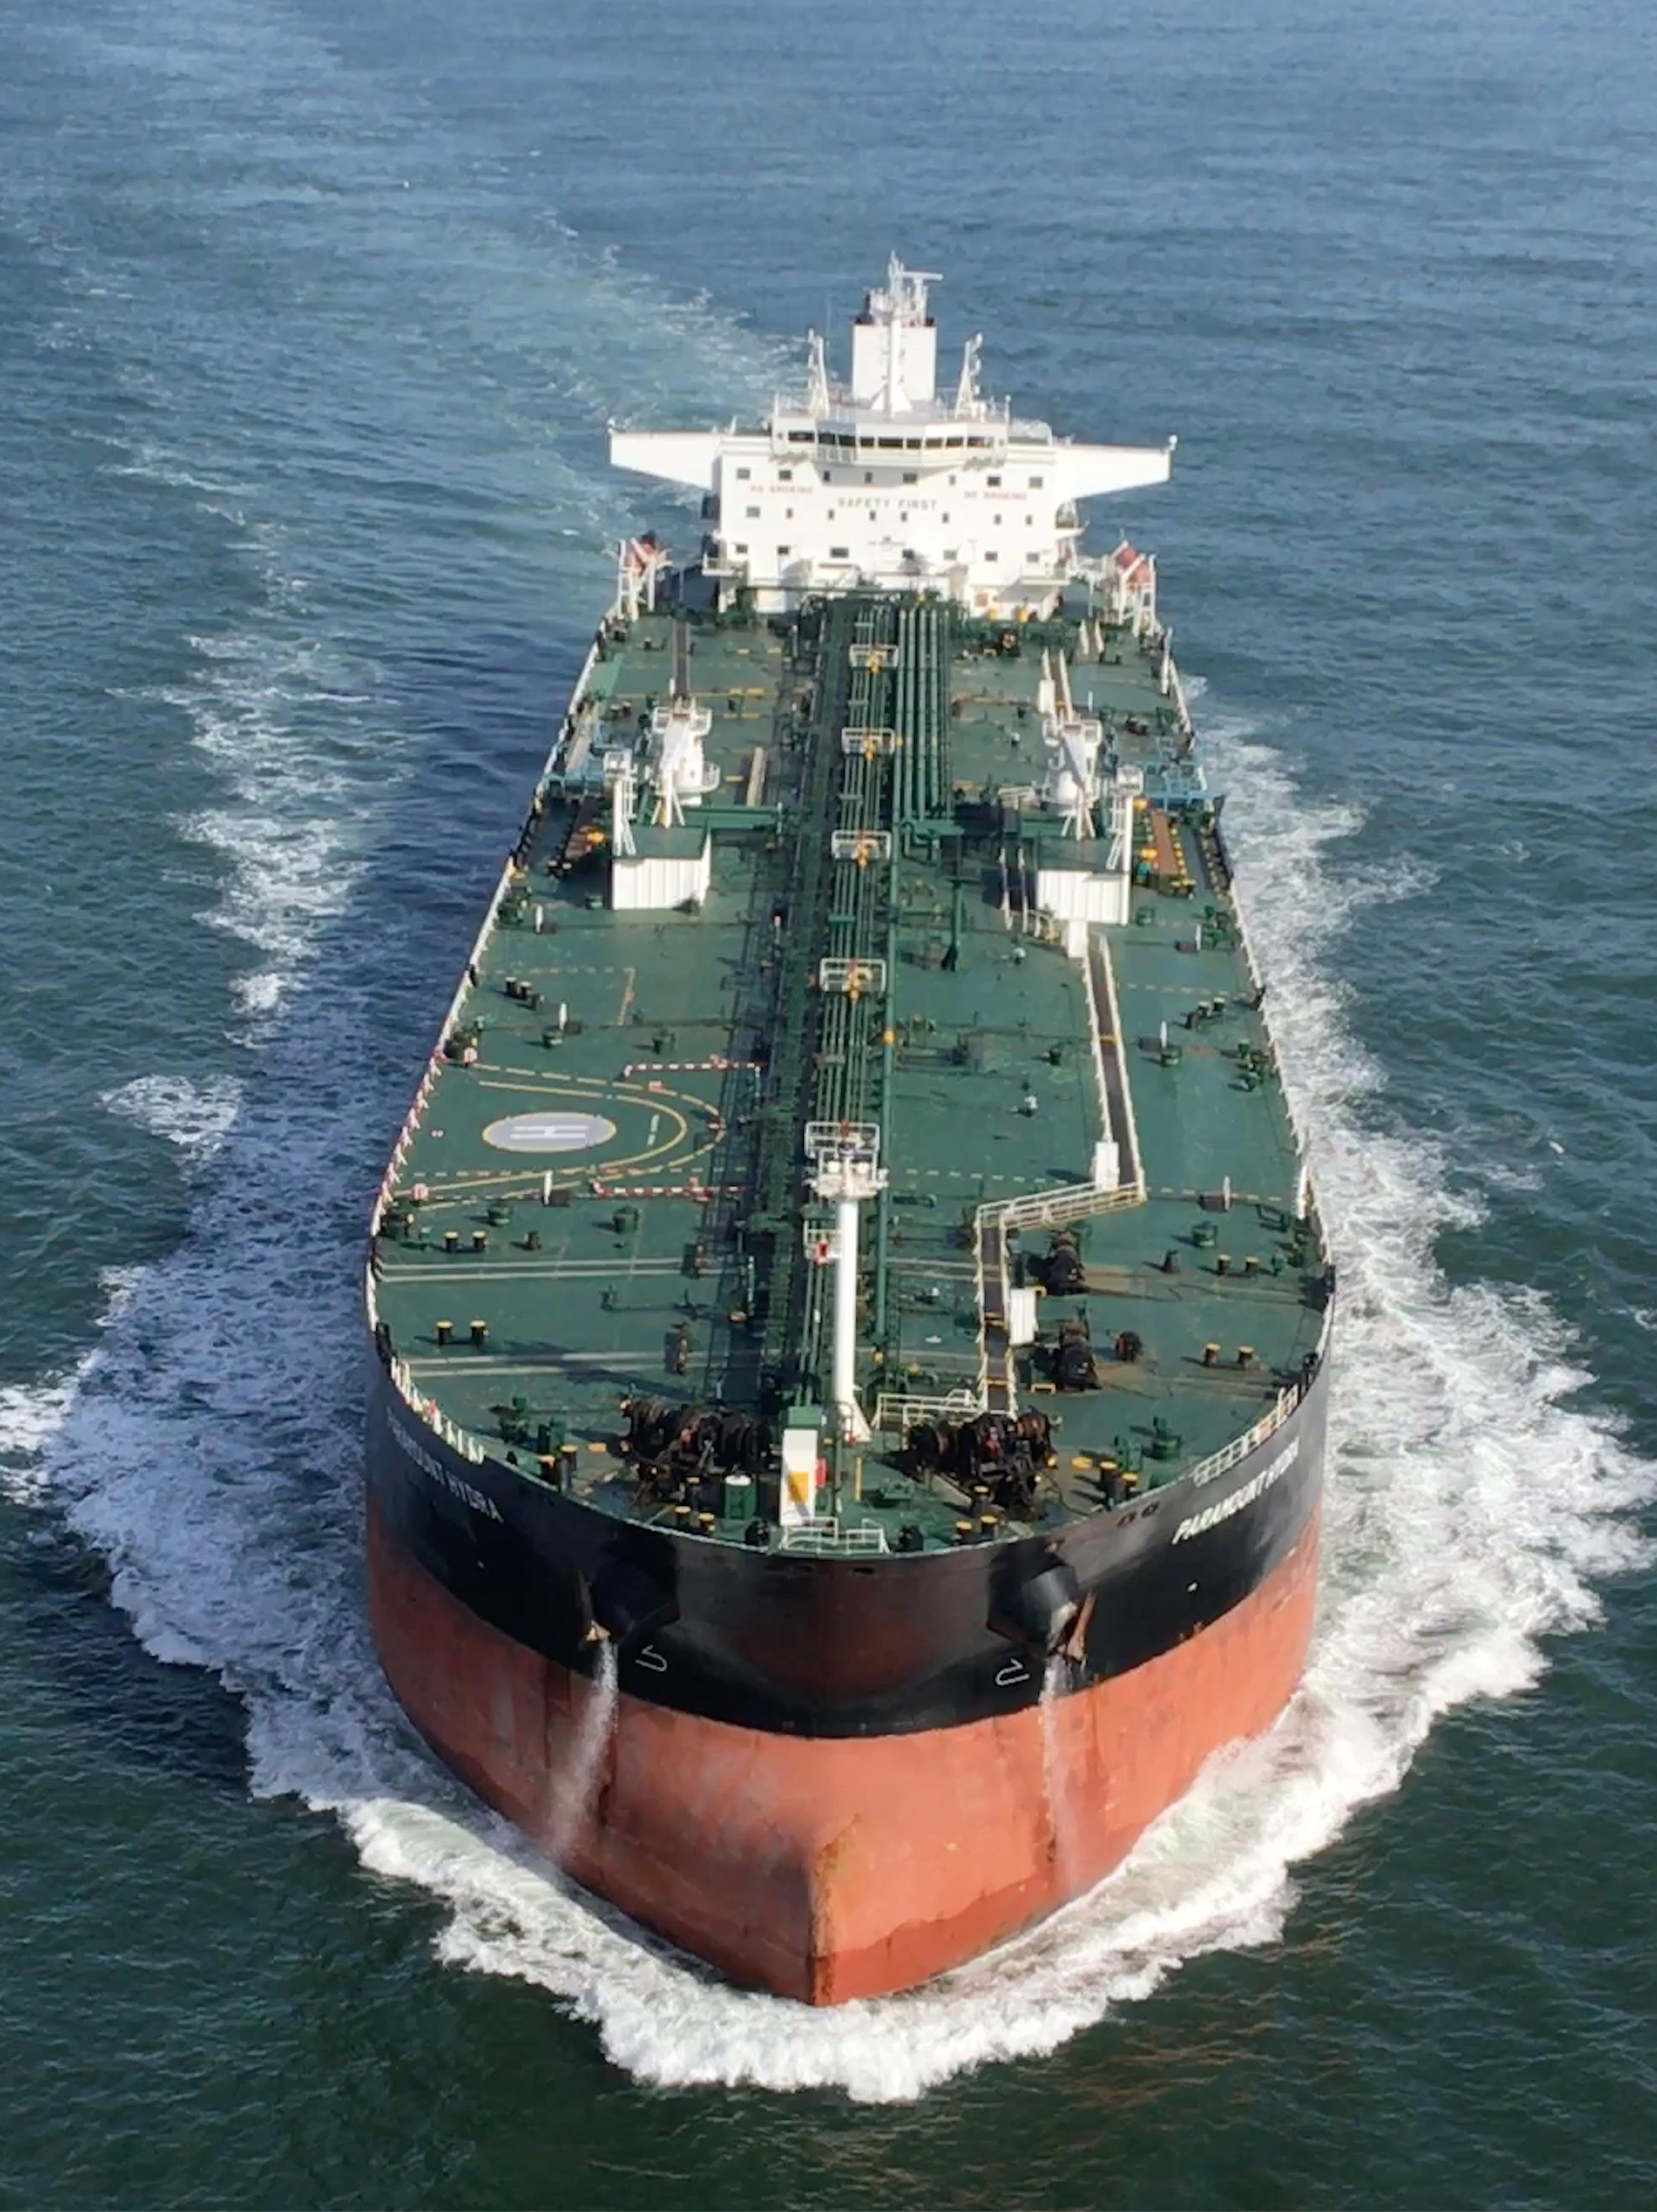 Free Images : ocean, sea, water transportation, tank ship ...